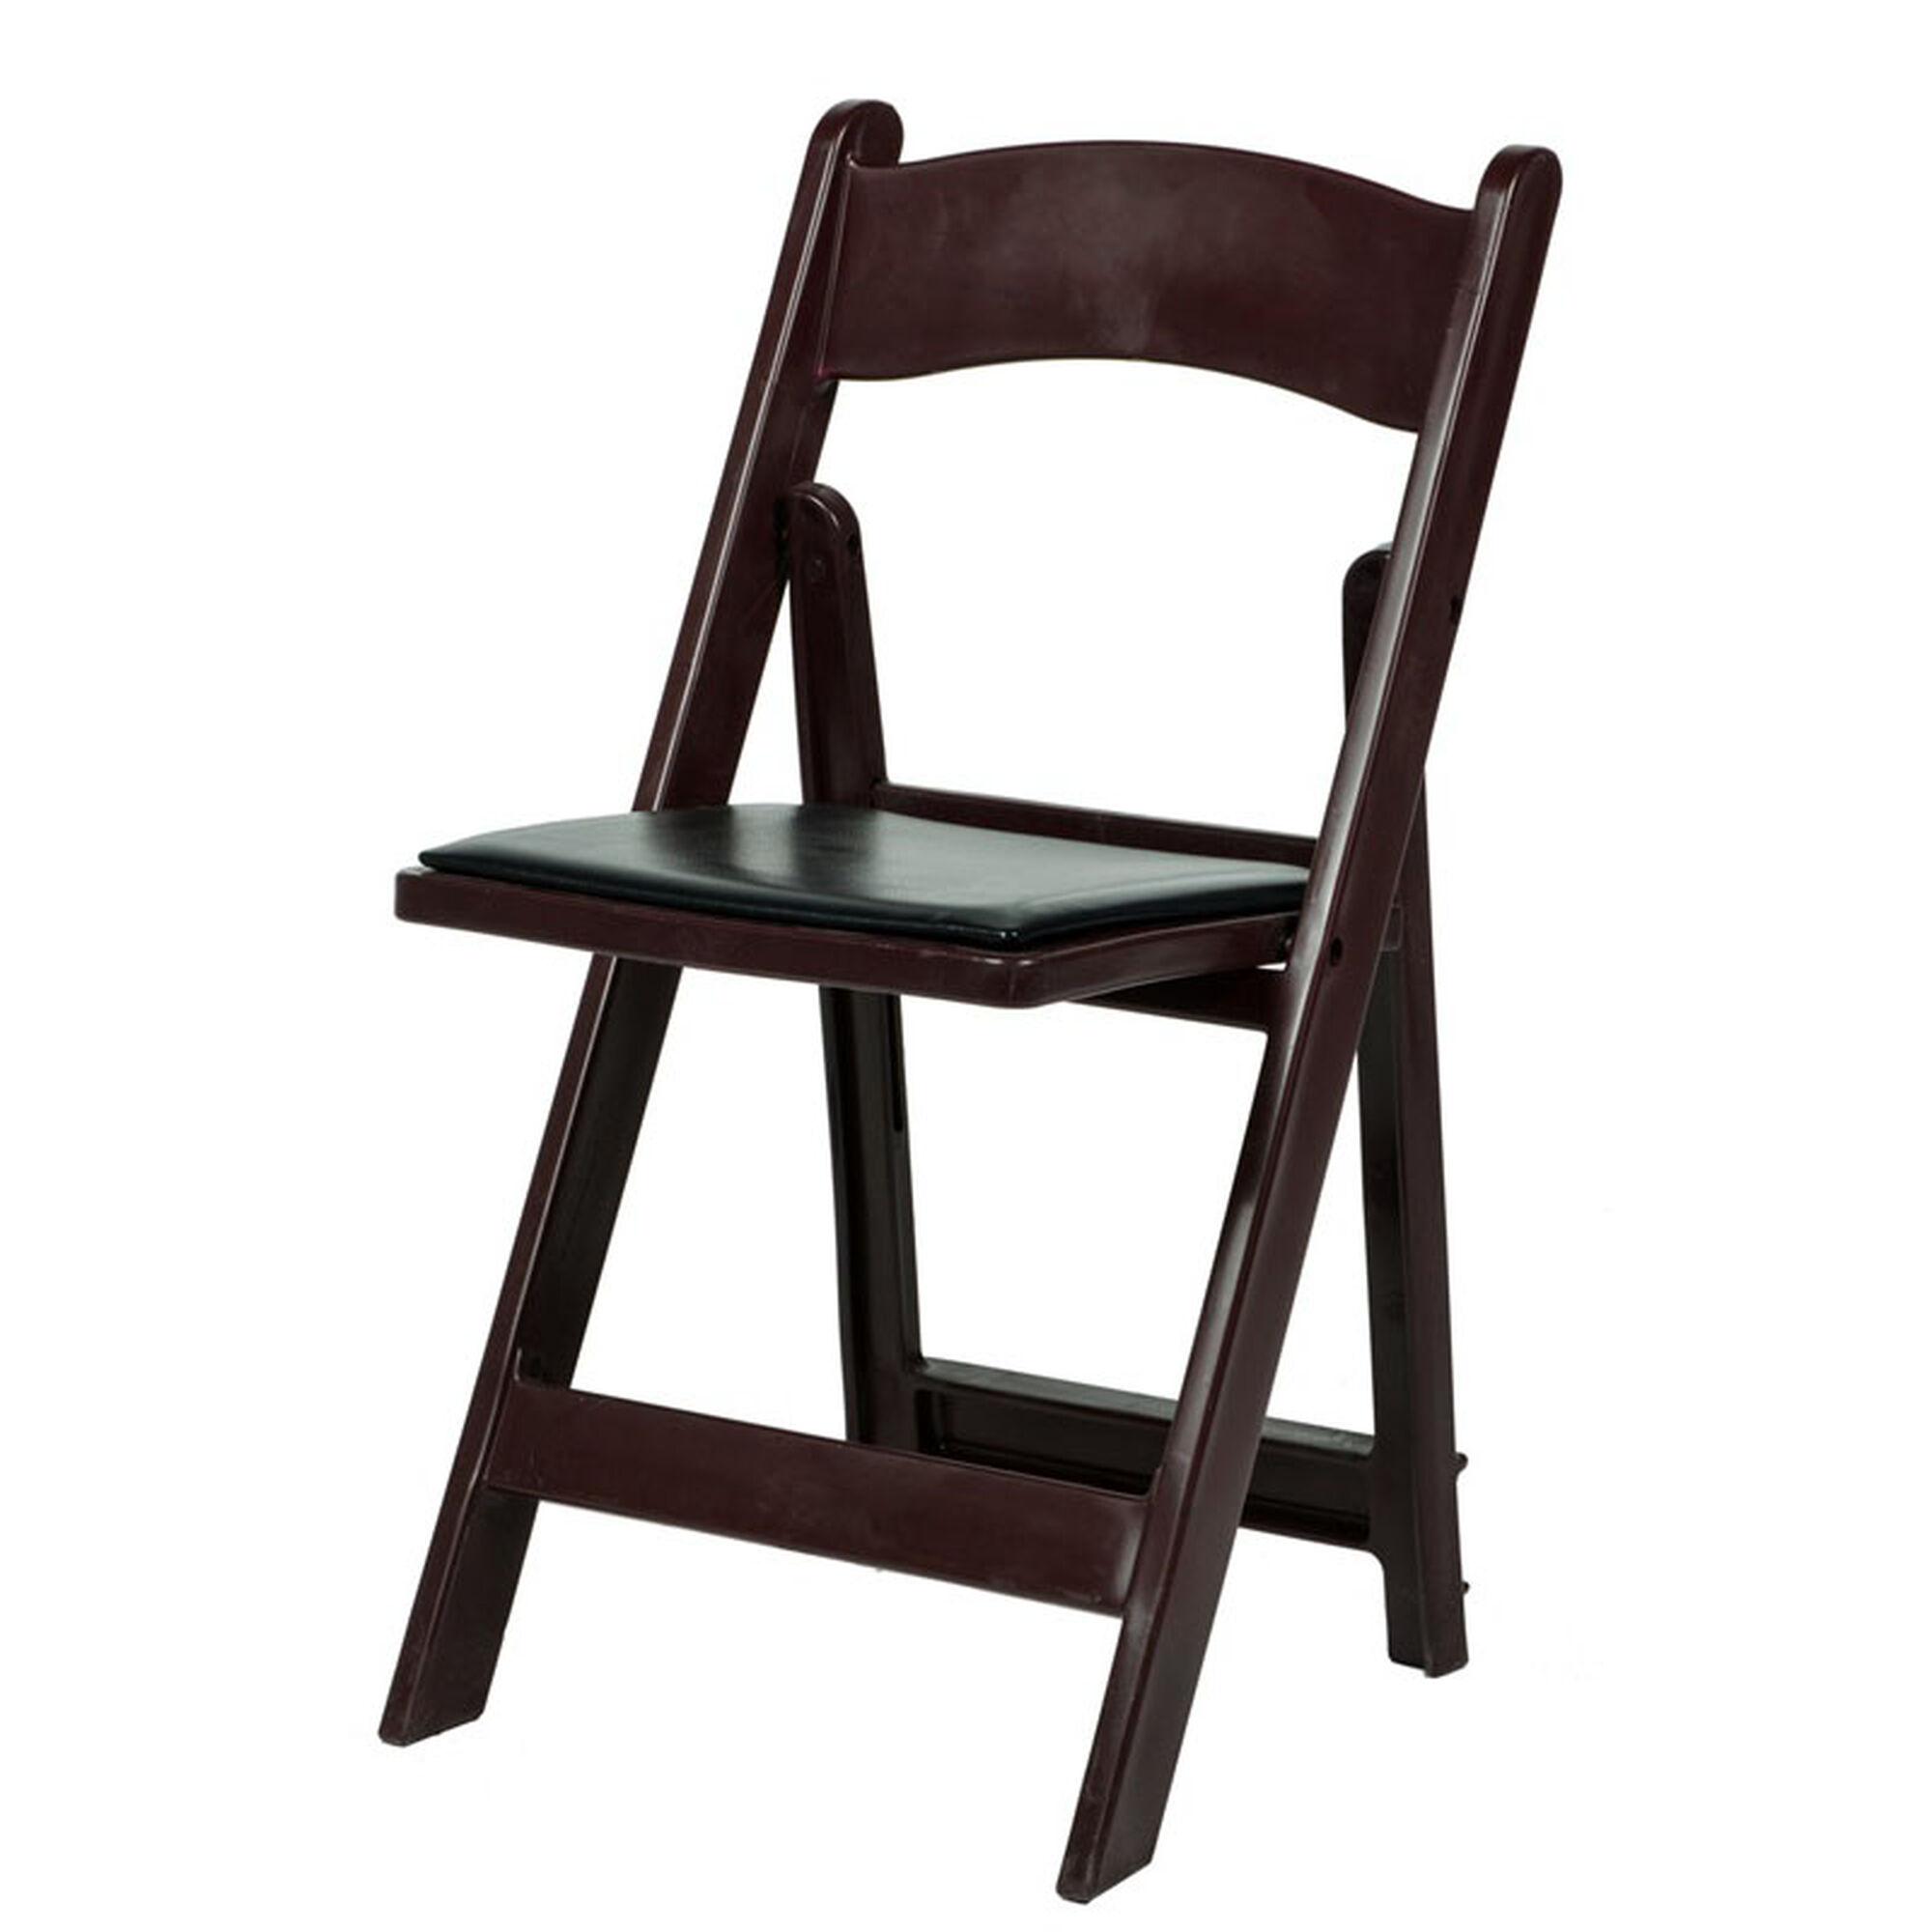 Strange 1000 Lb Max Red Mahogany Resin Folding Chair Theyellowbook Wood Chair Design Ideas Theyellowbookinfo